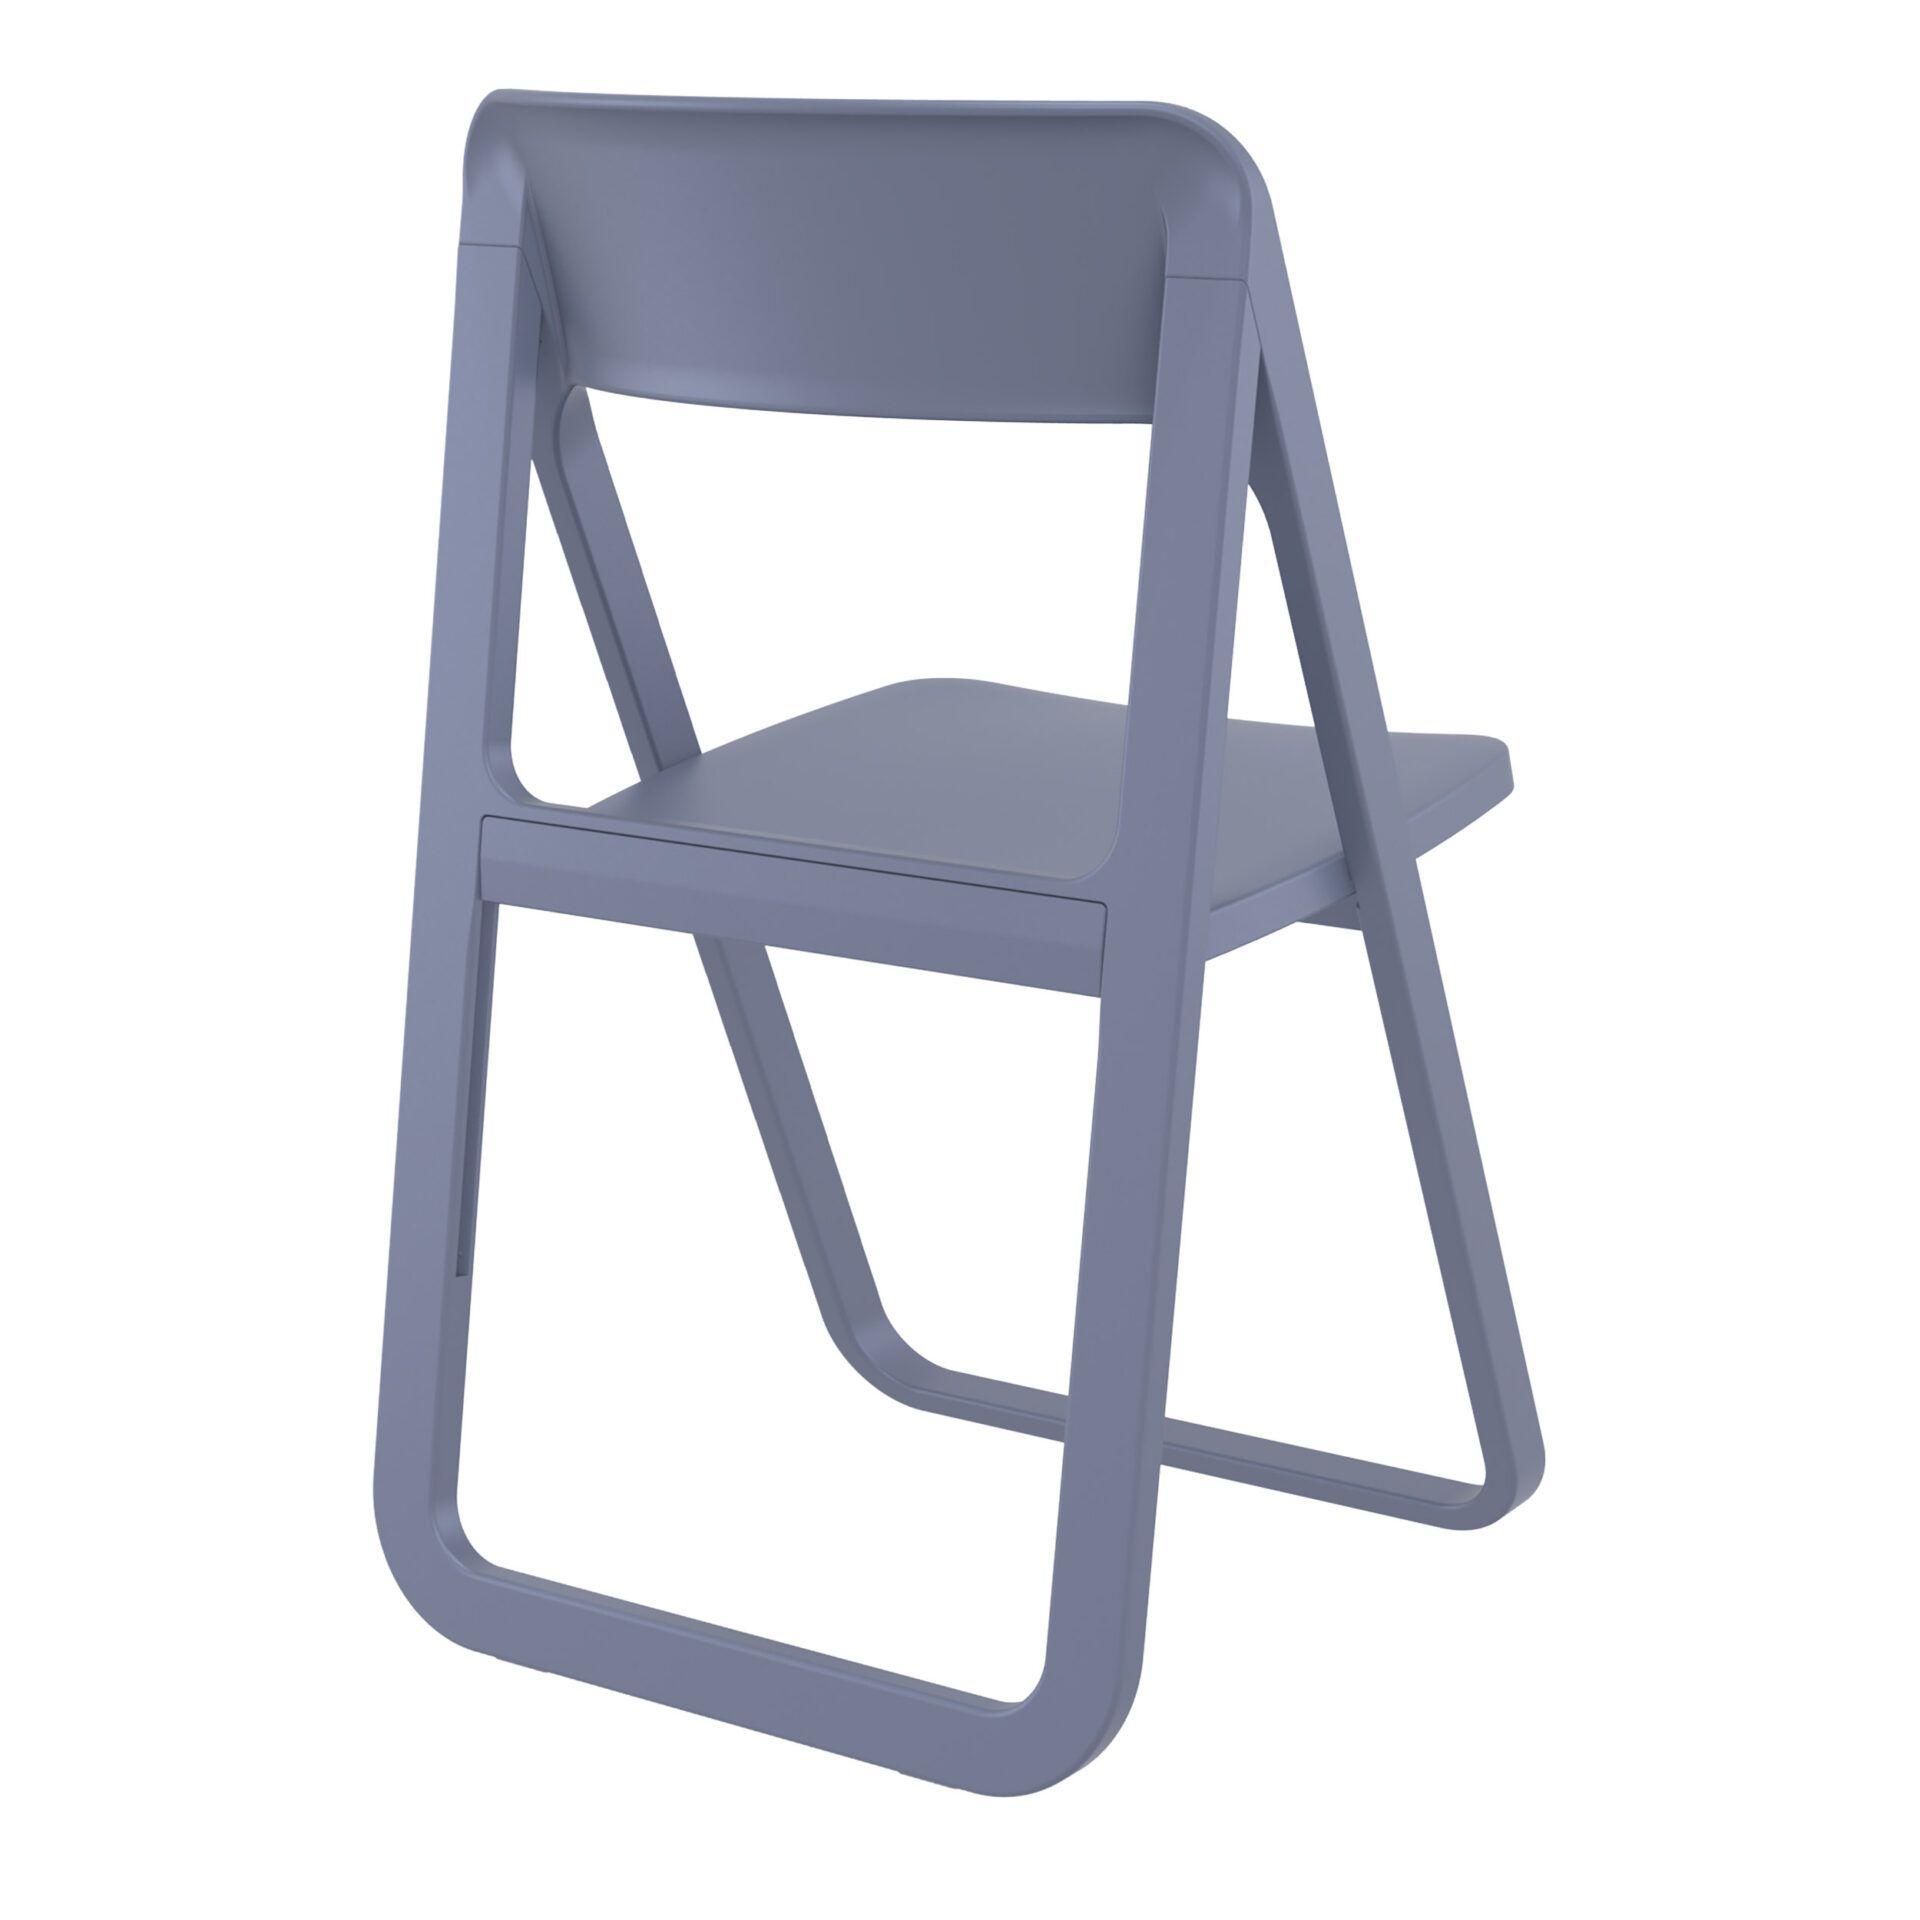 polypropylene dream folding chair darkgrey back side